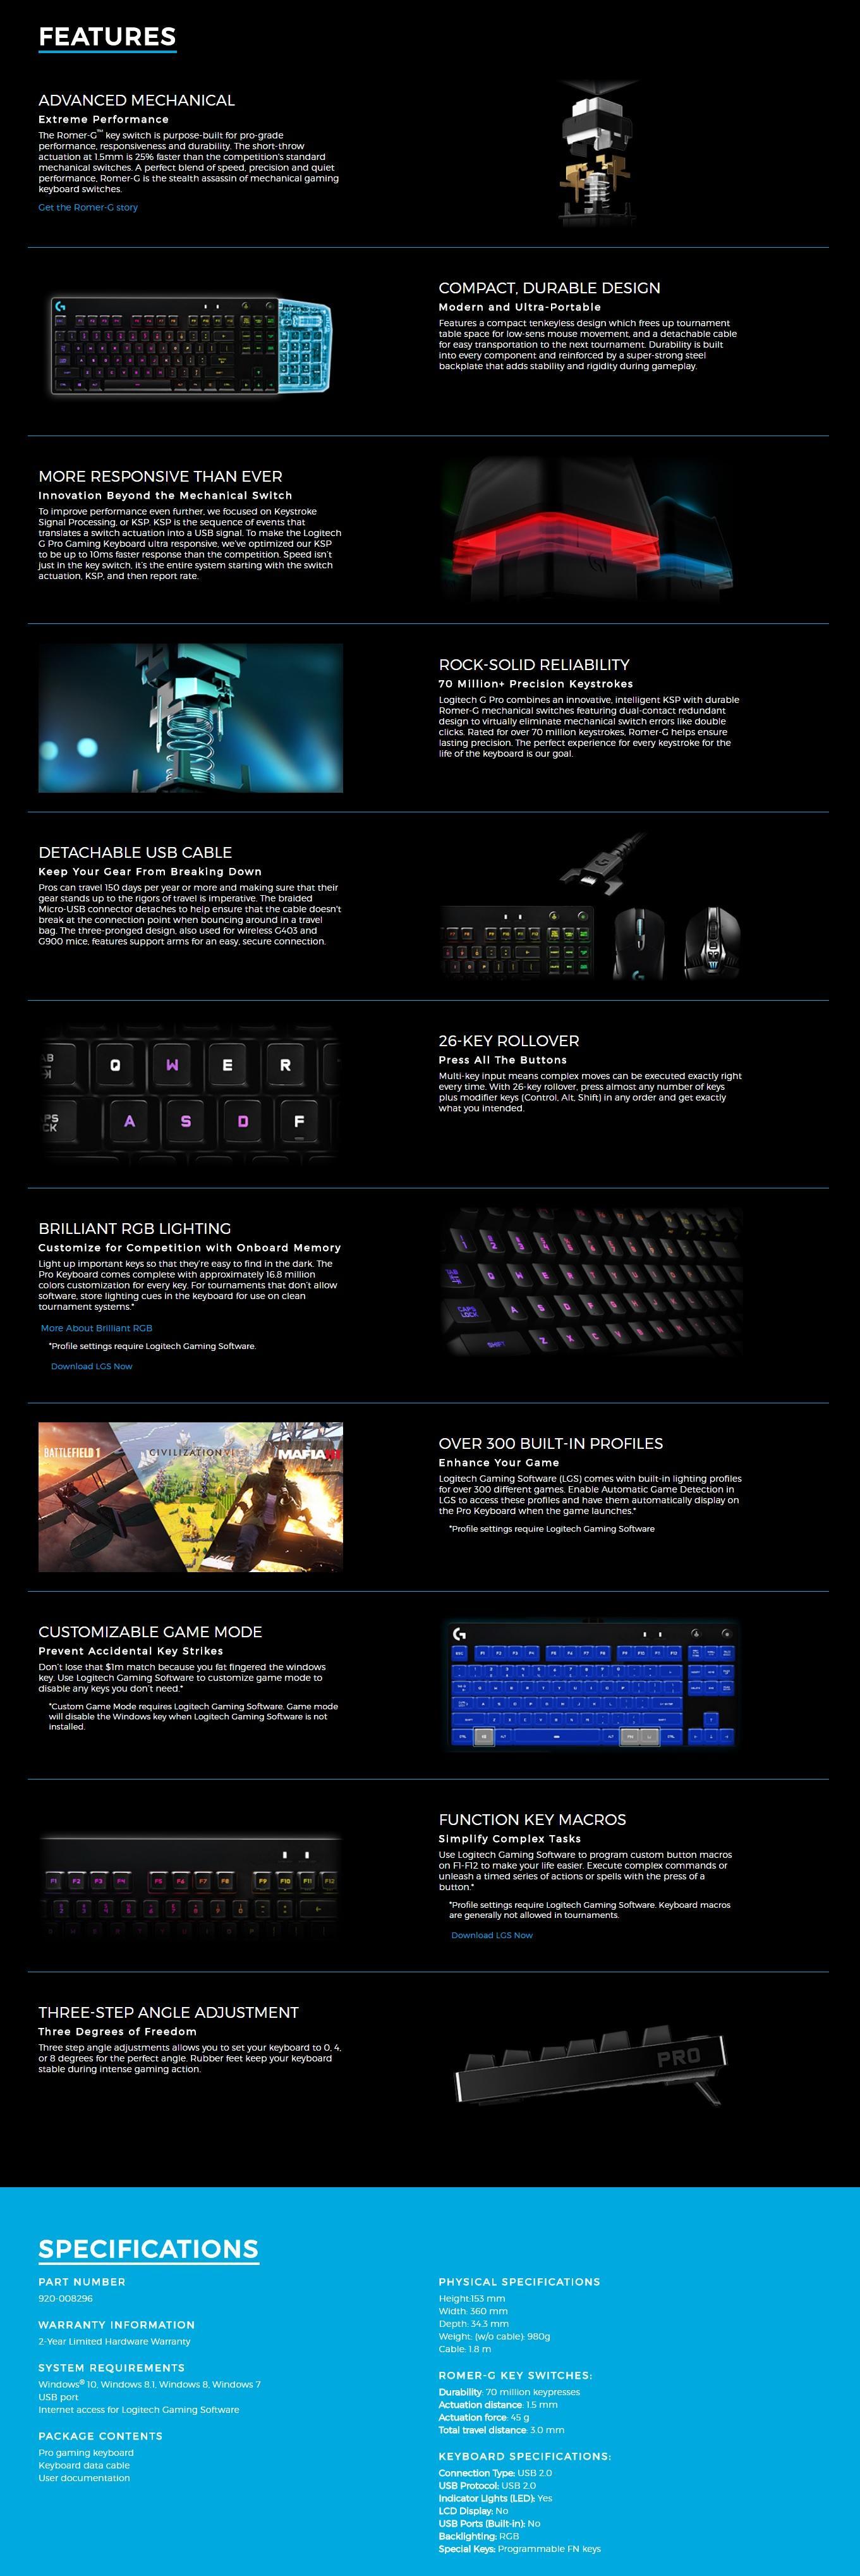 920-008296-Logitech-PRO-Gaming-Keyboard-desc.jpg